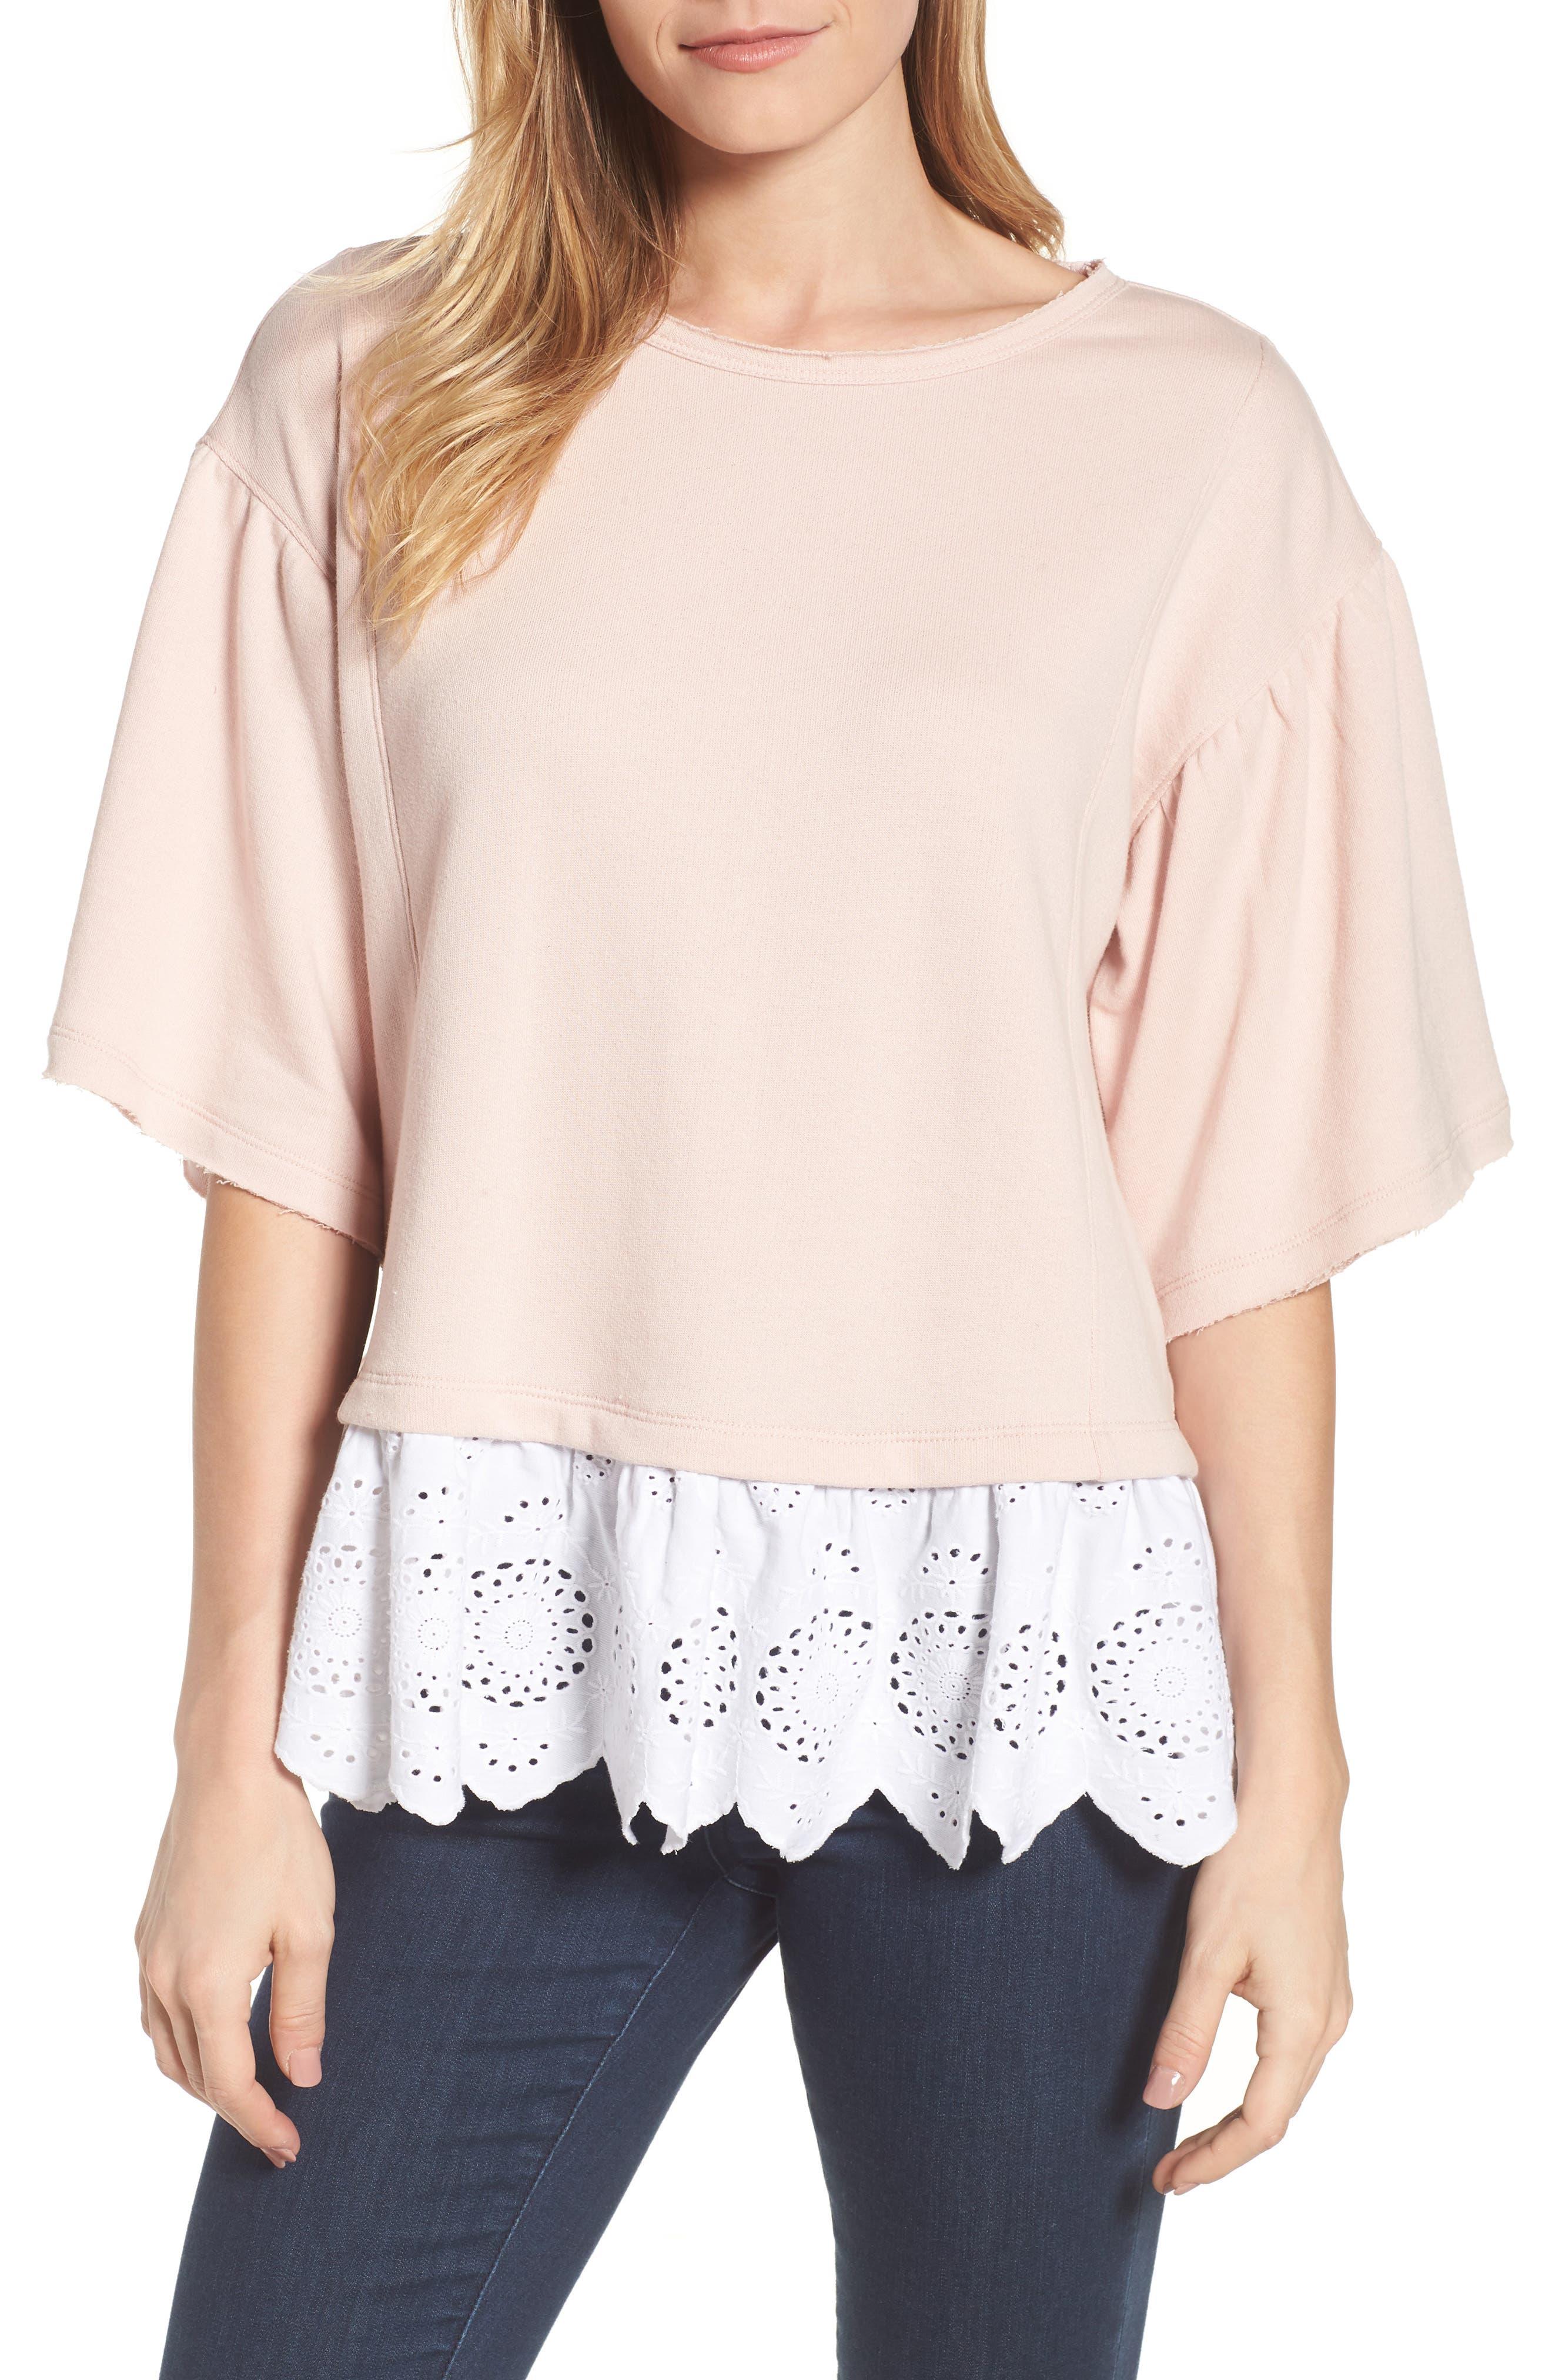 Twofer Sweatshirt,                         Main,                         color, Pink Smoke- White